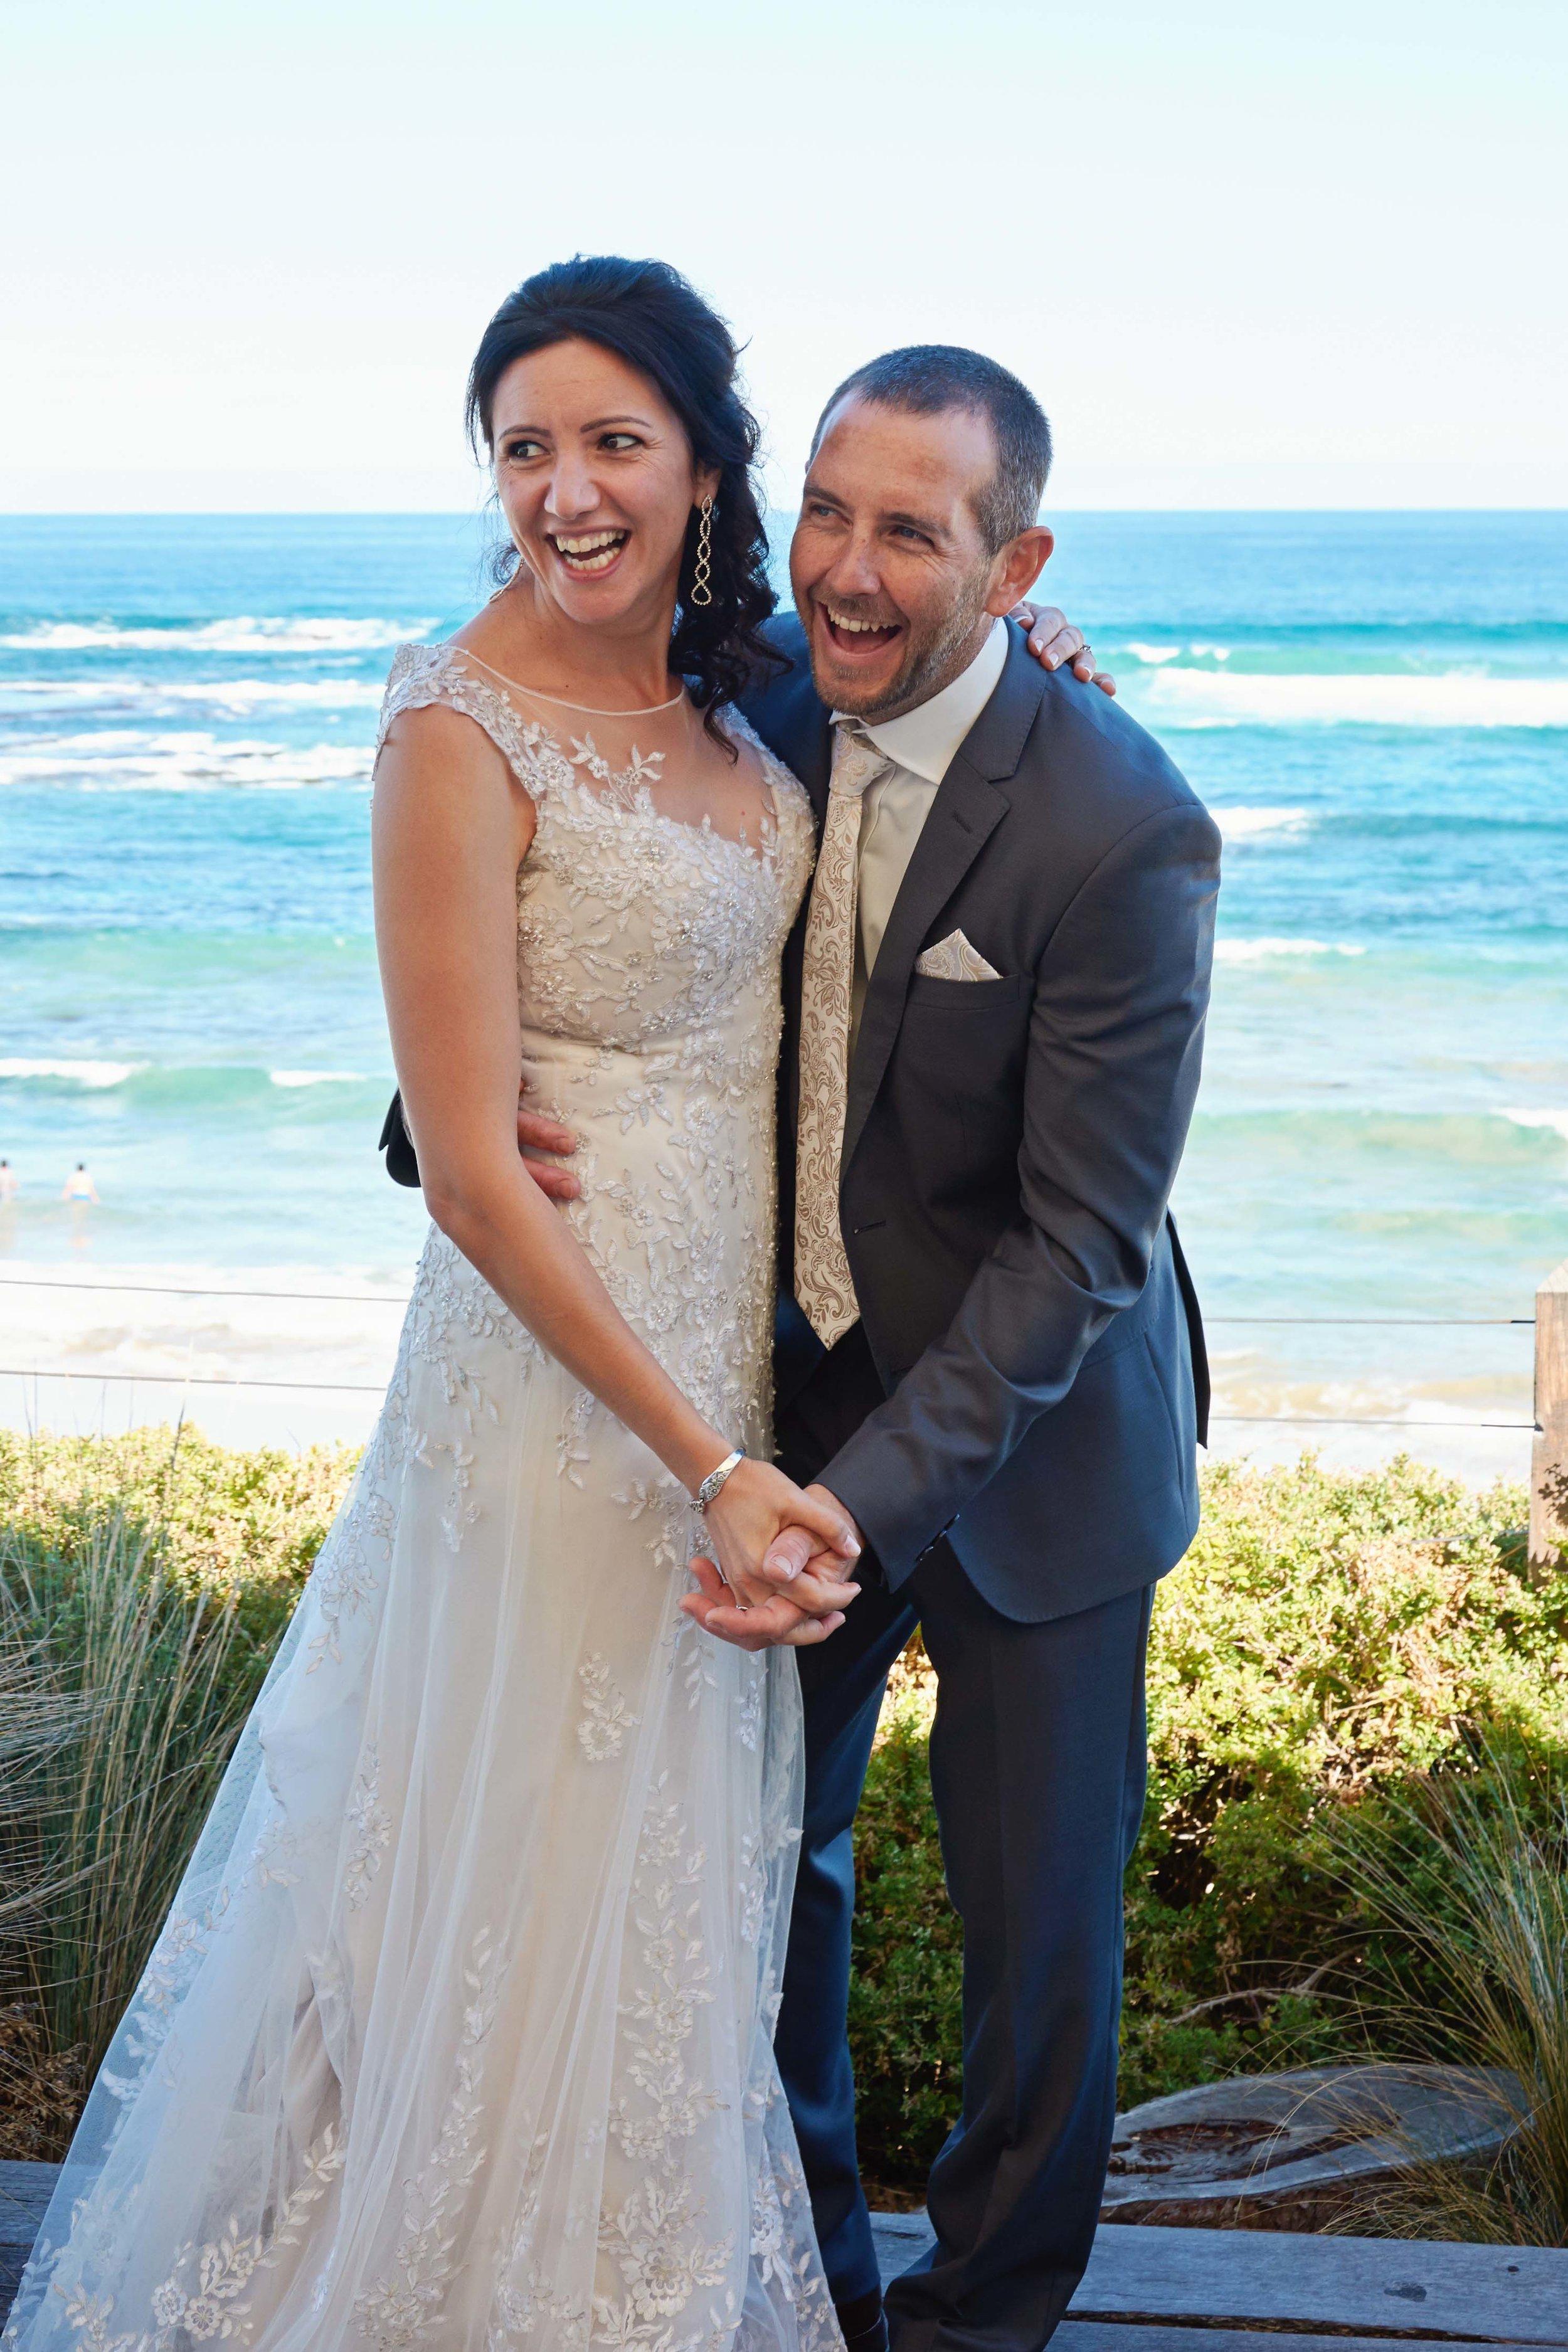 sorrento-wedding-photography-all-smiles-marissa-jade-photography-75.jpg